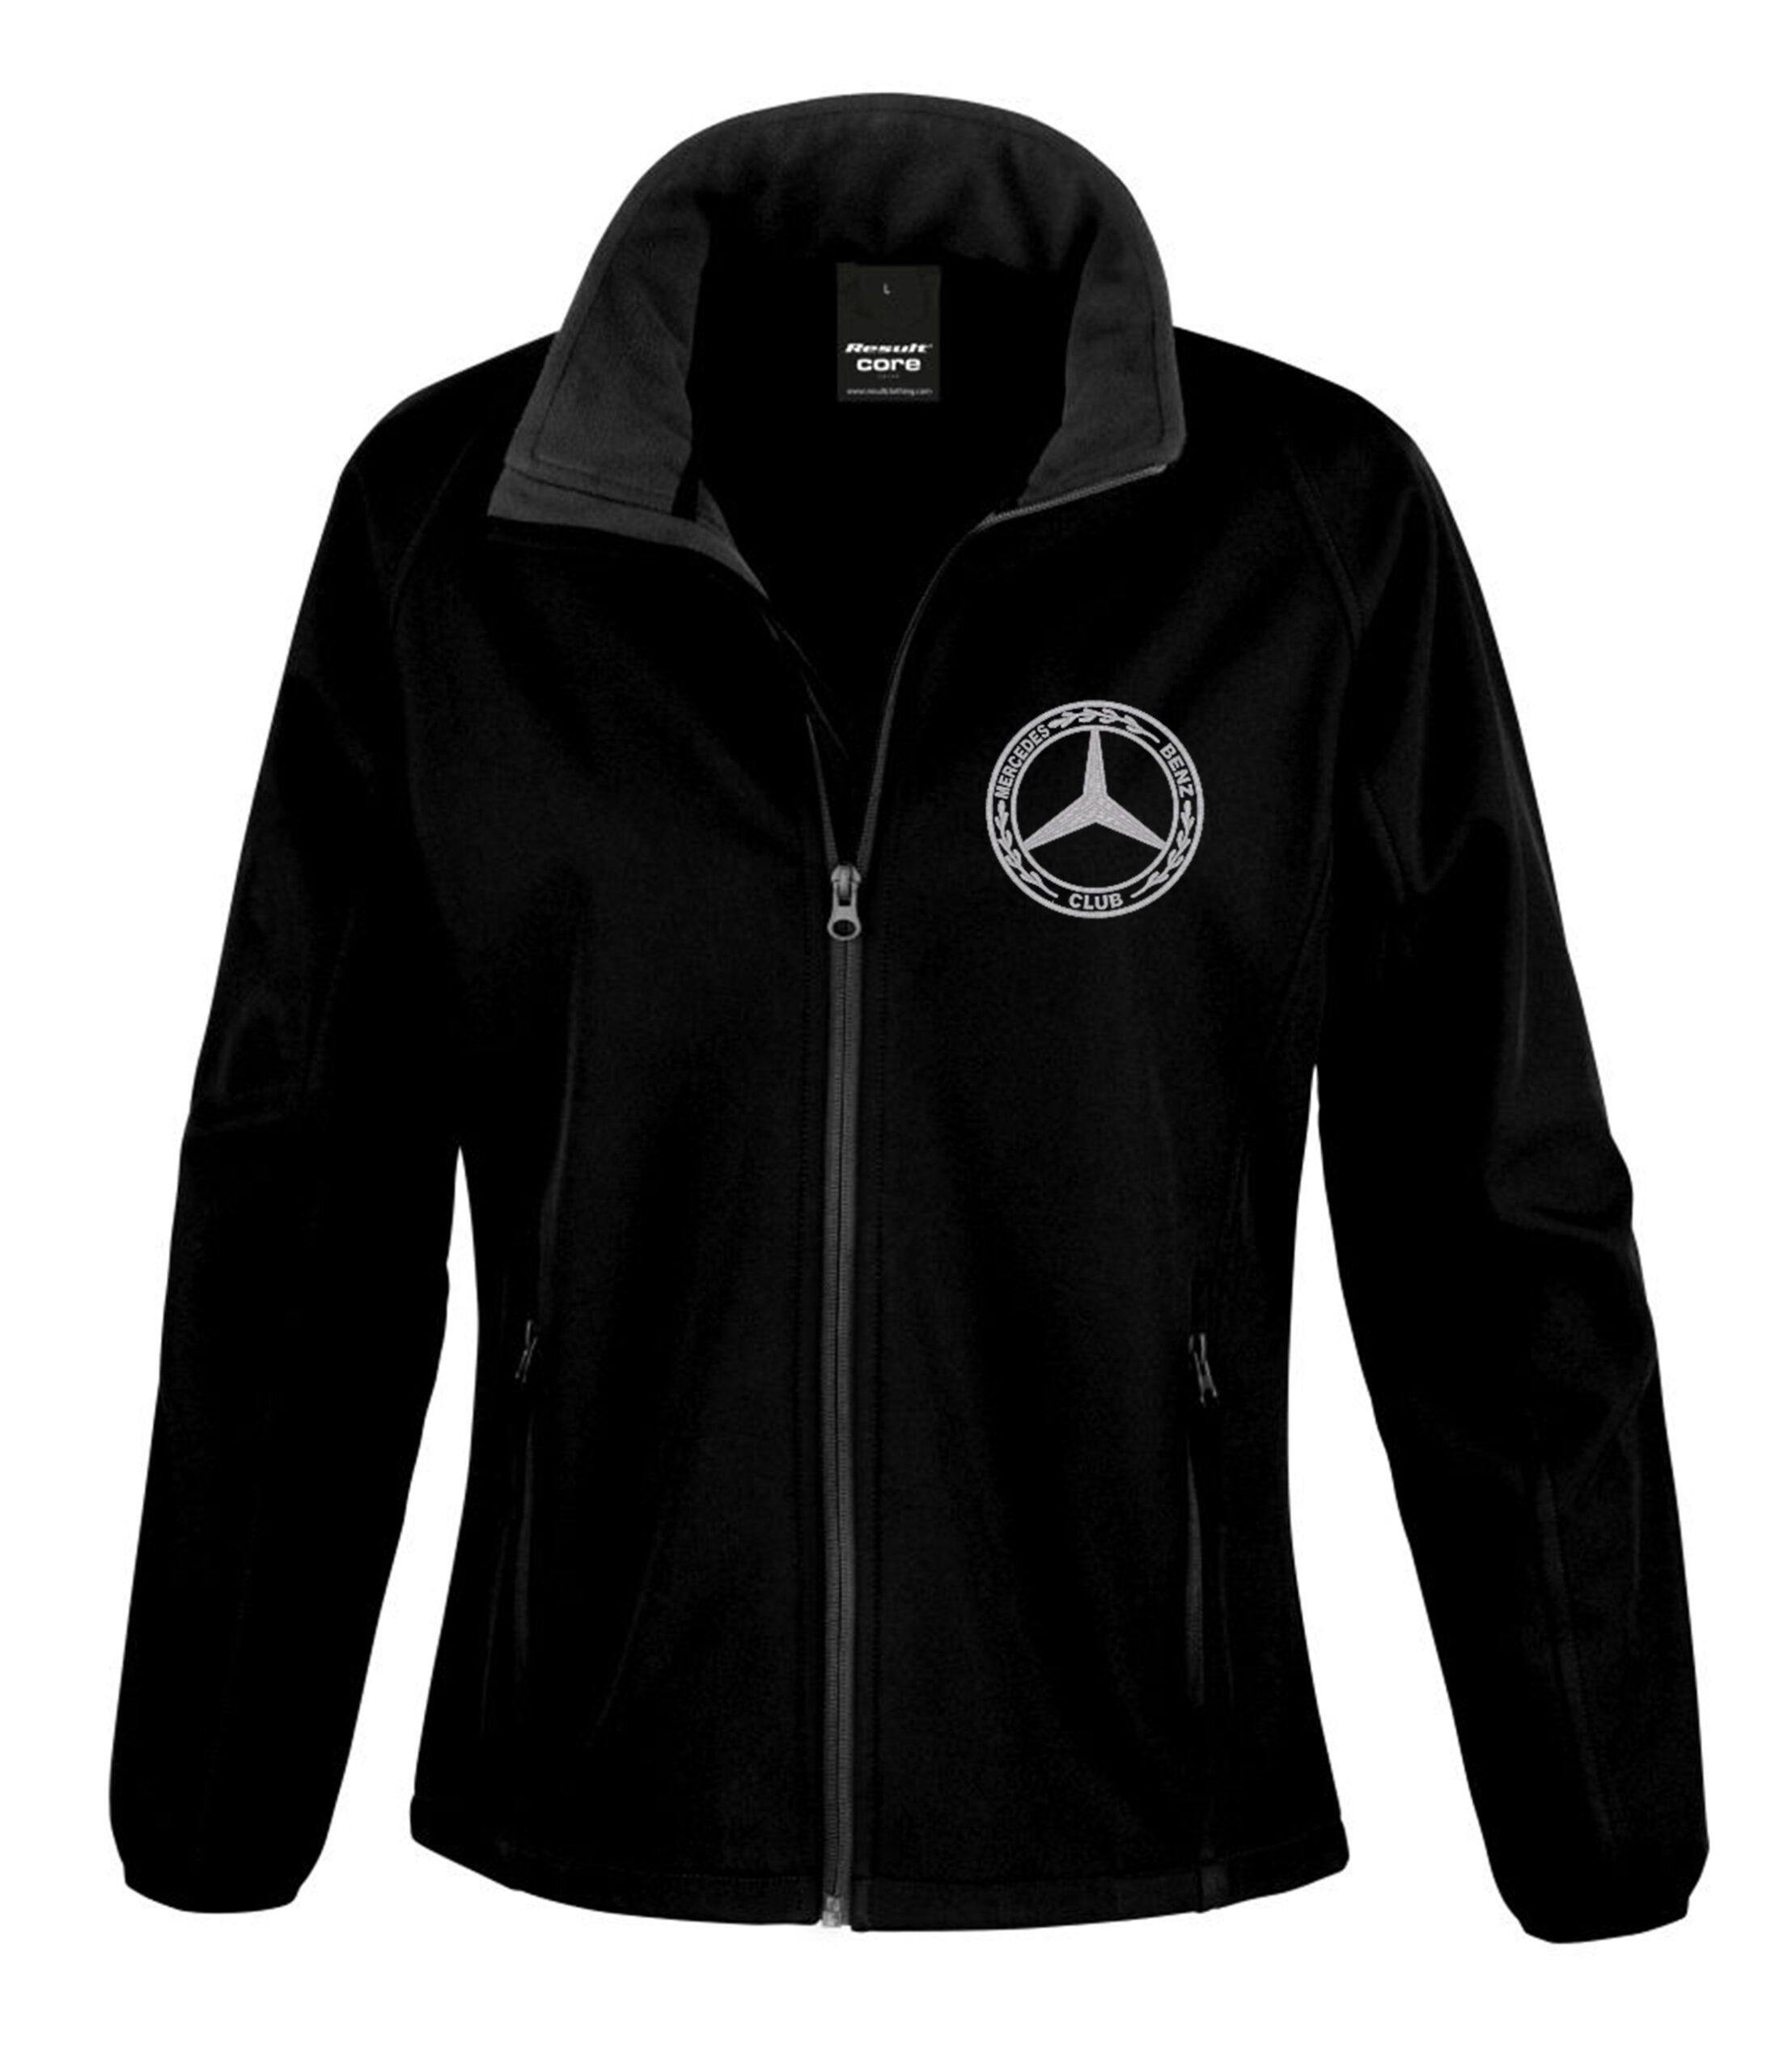 Mercedes-Benz Ladies Soft Shell Jacket Black